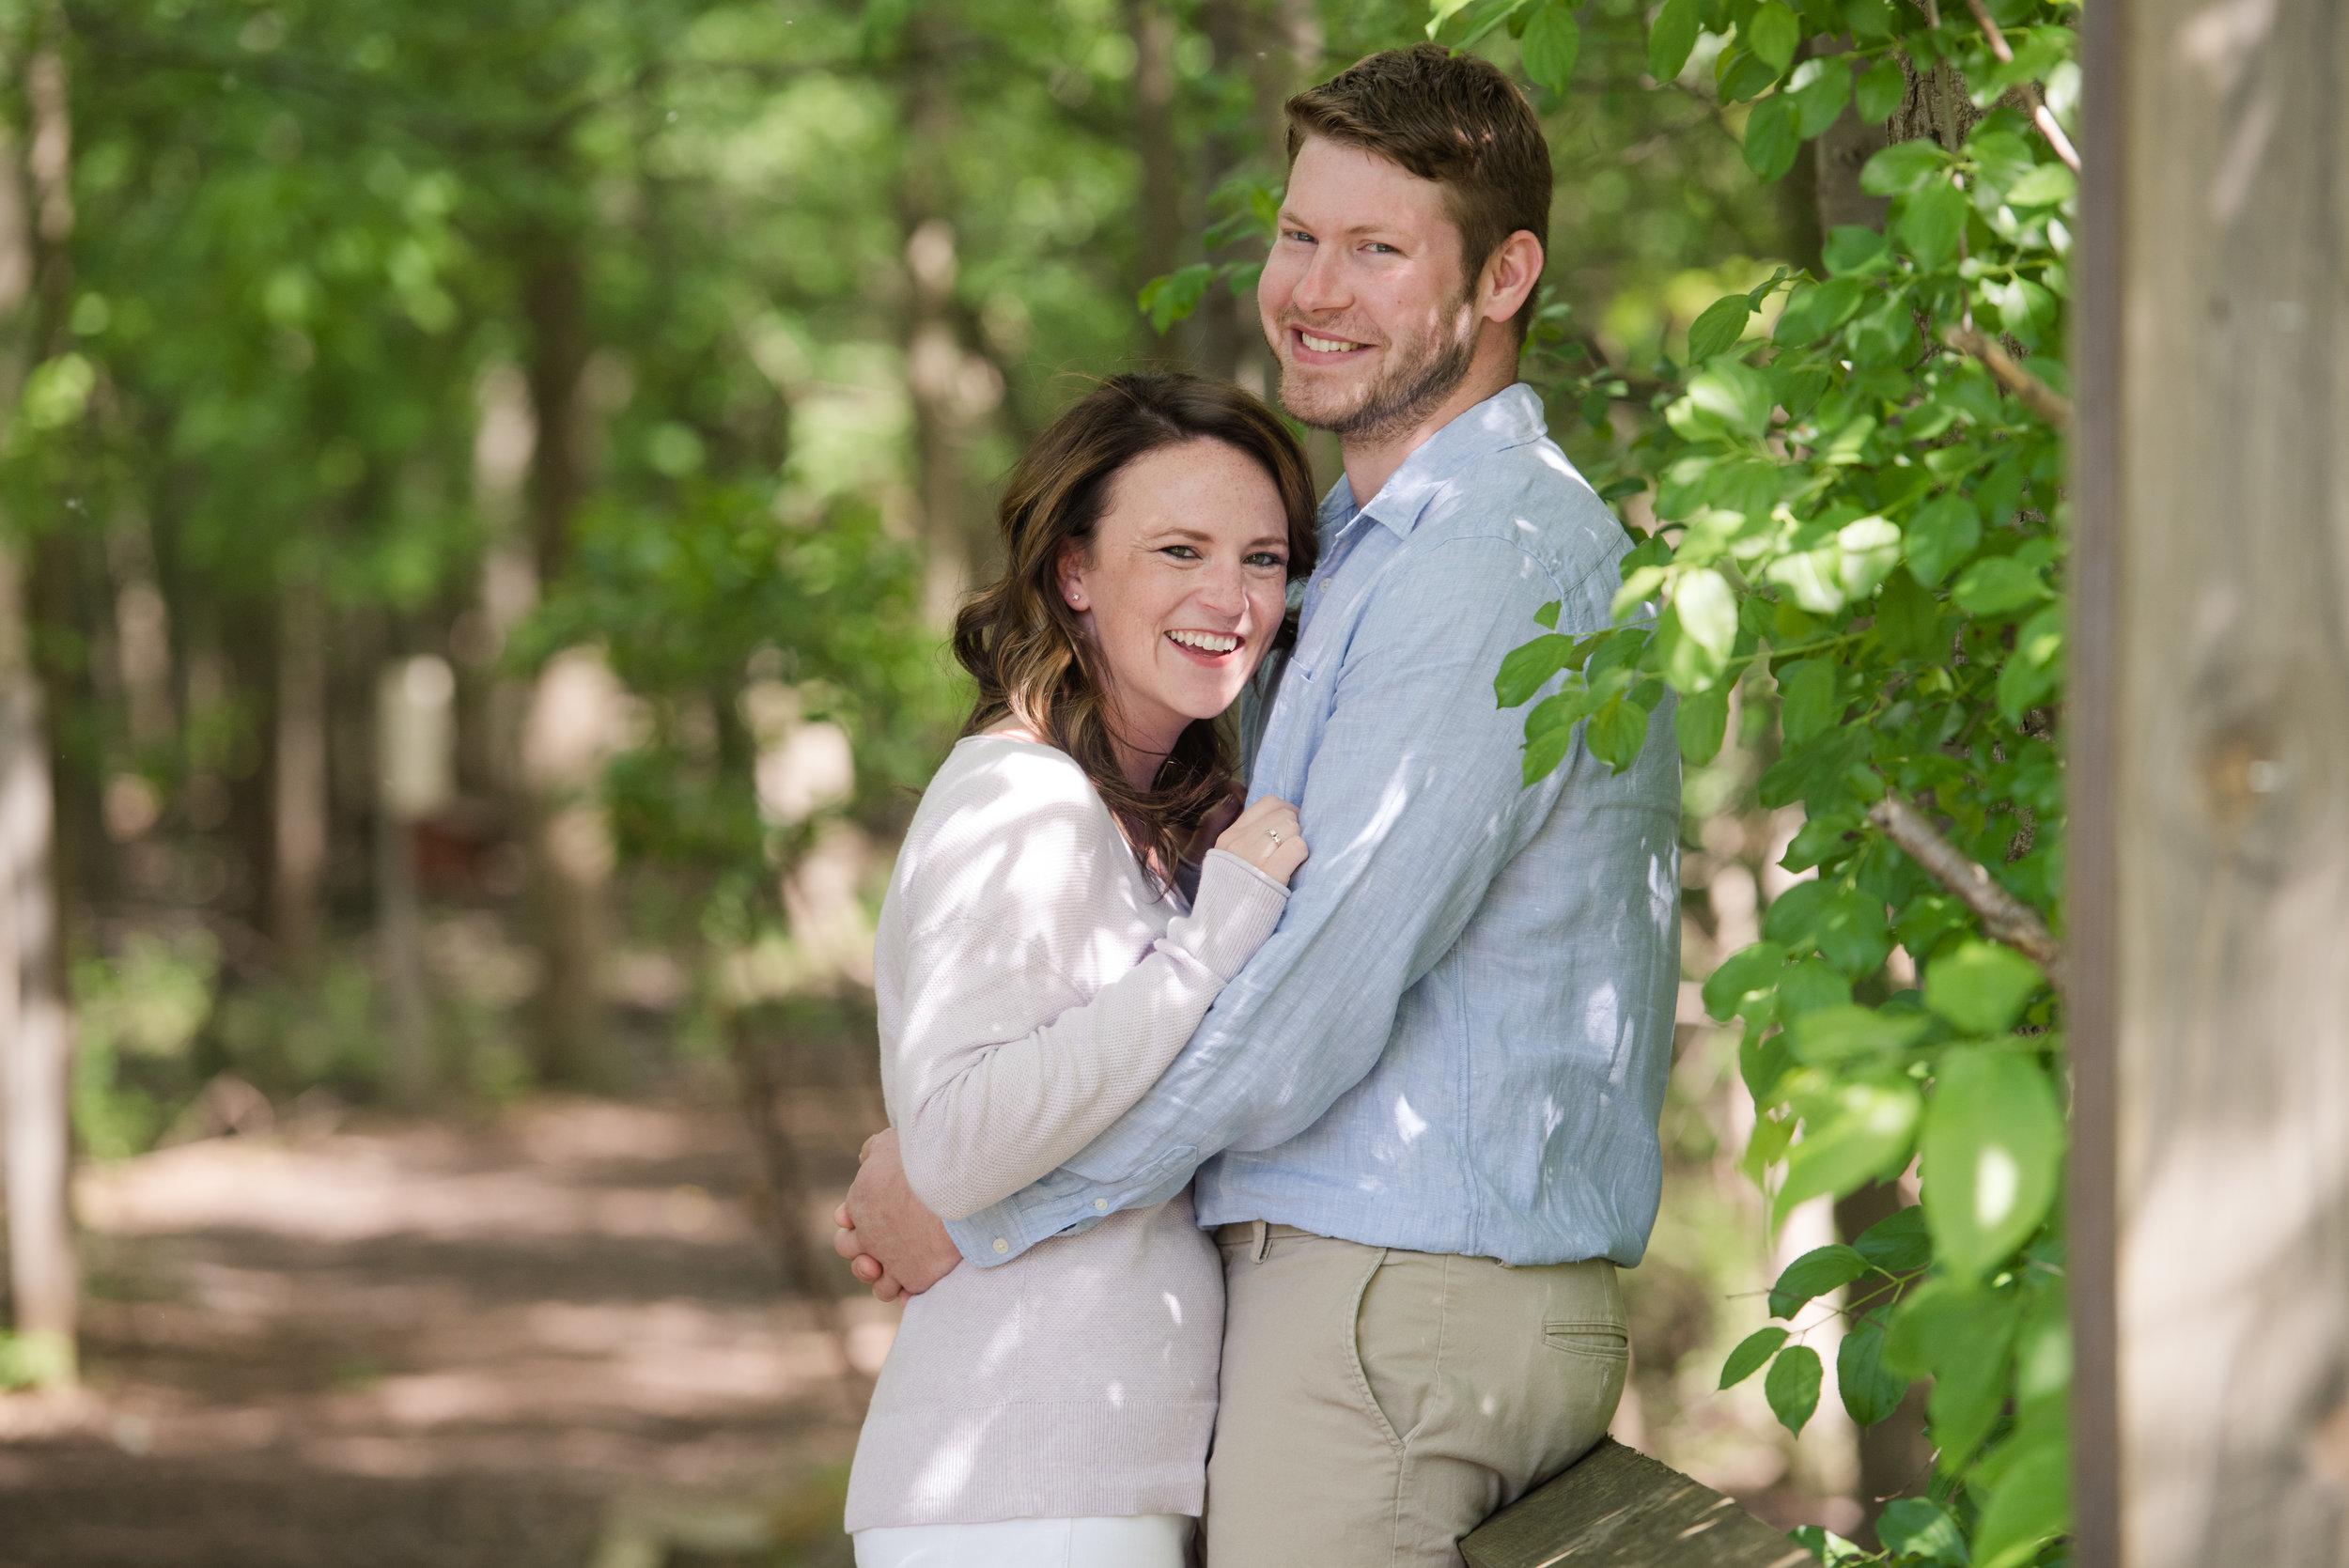 GALLERY-2019-6-9 Kaitlin, Justin & Liam Engagement 0481 51.jpg